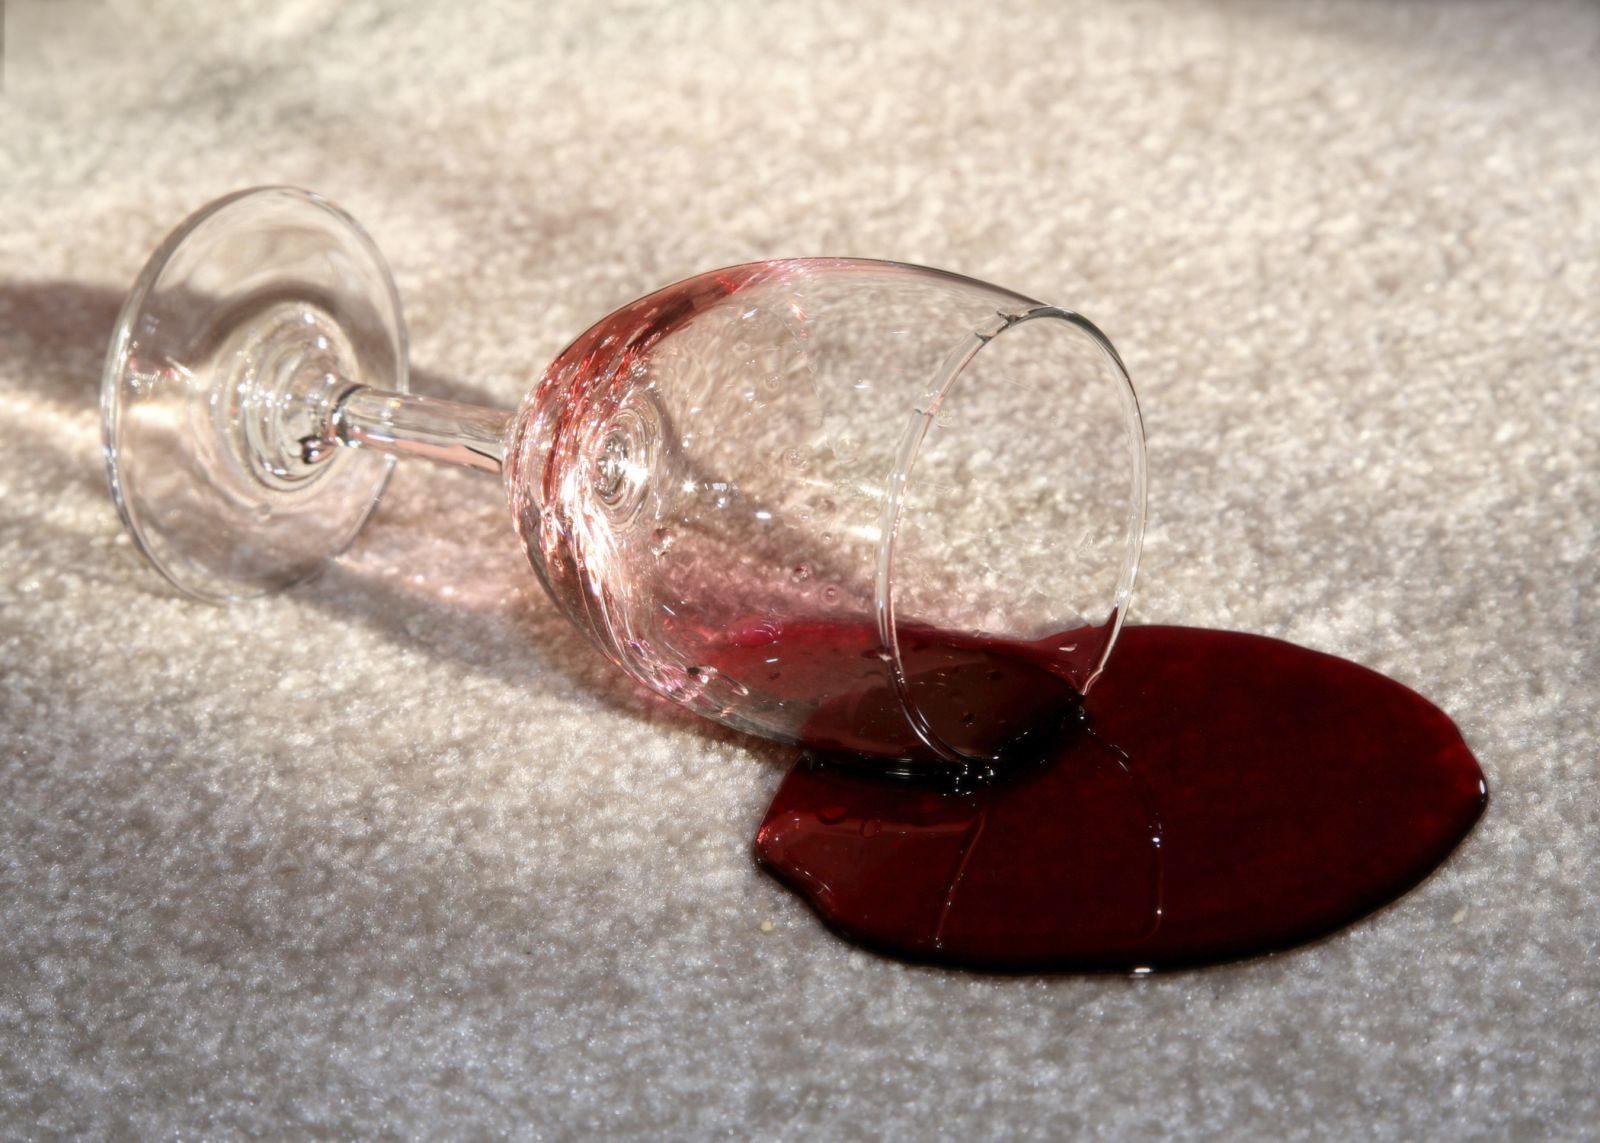 Как удалить пятна от красного вина на ковре фото